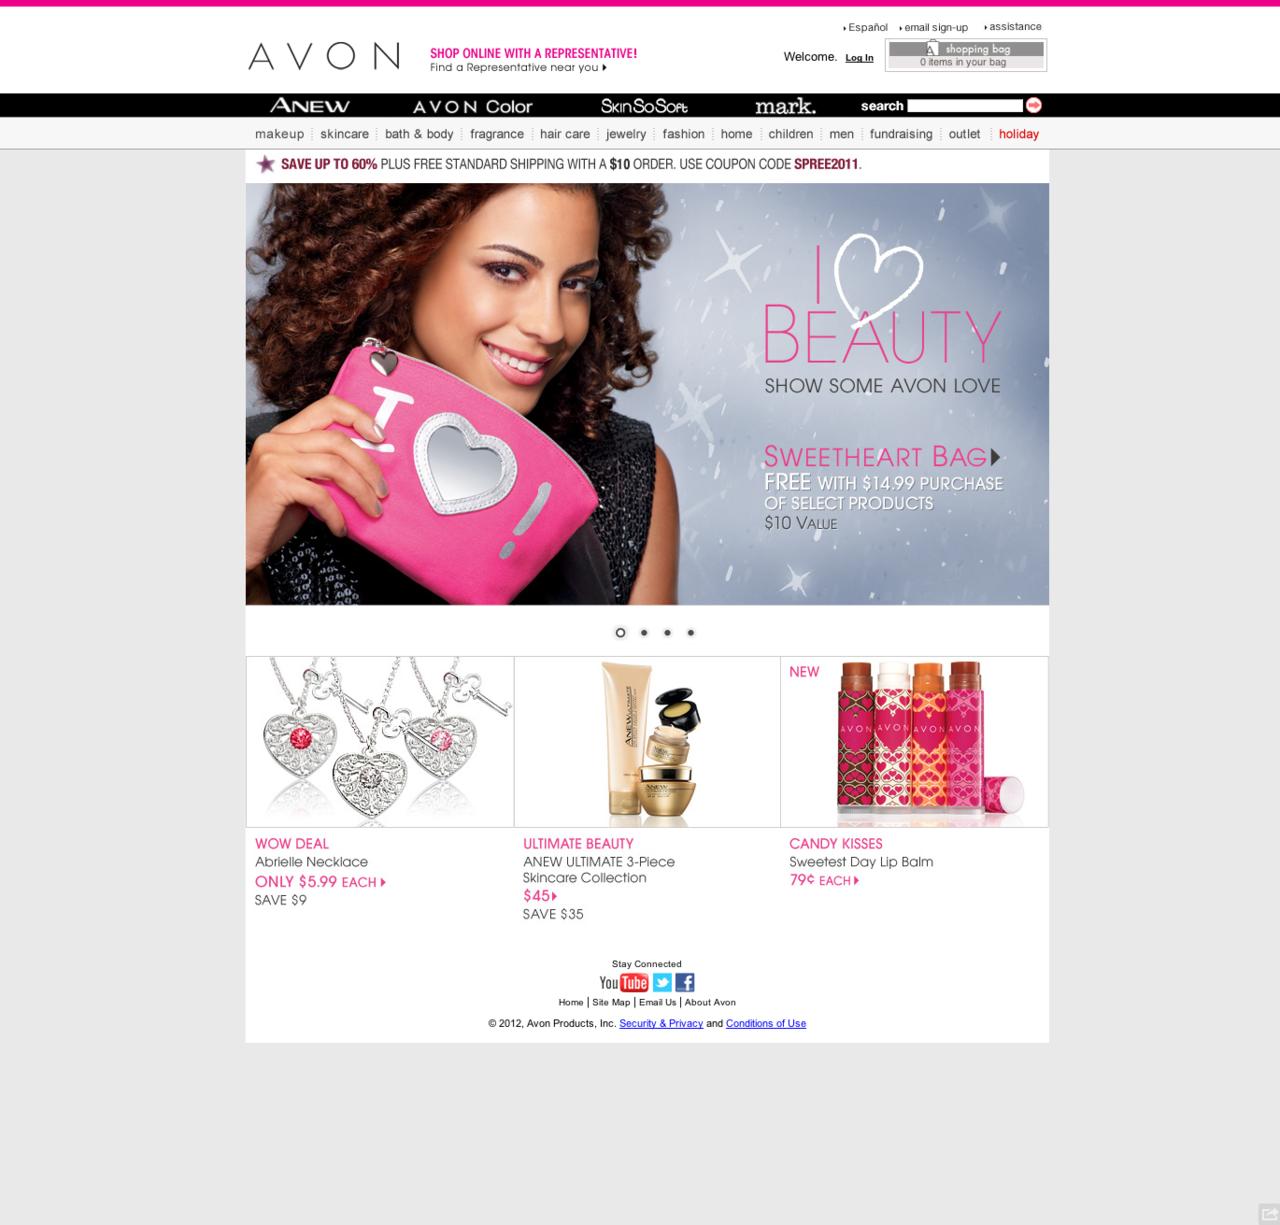 www.avon.com